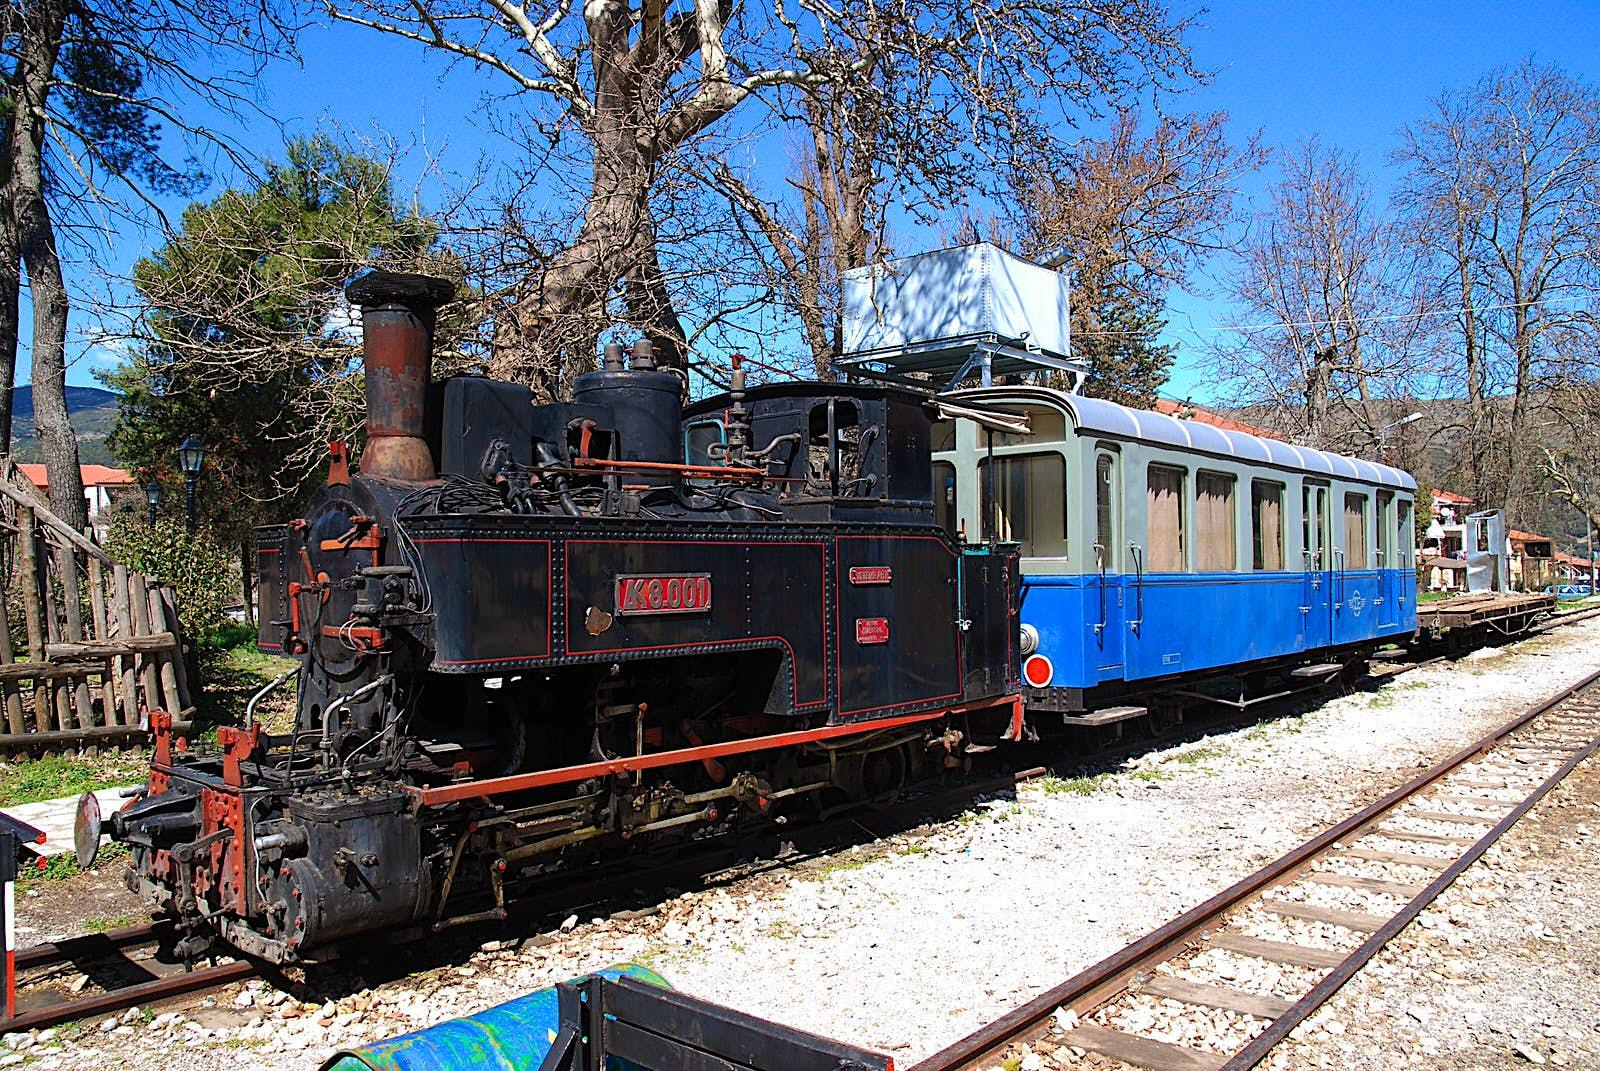 The steam locomotive of the Diakofto-Kalavryta railway © K Krallis / CC BY-SA 3.0